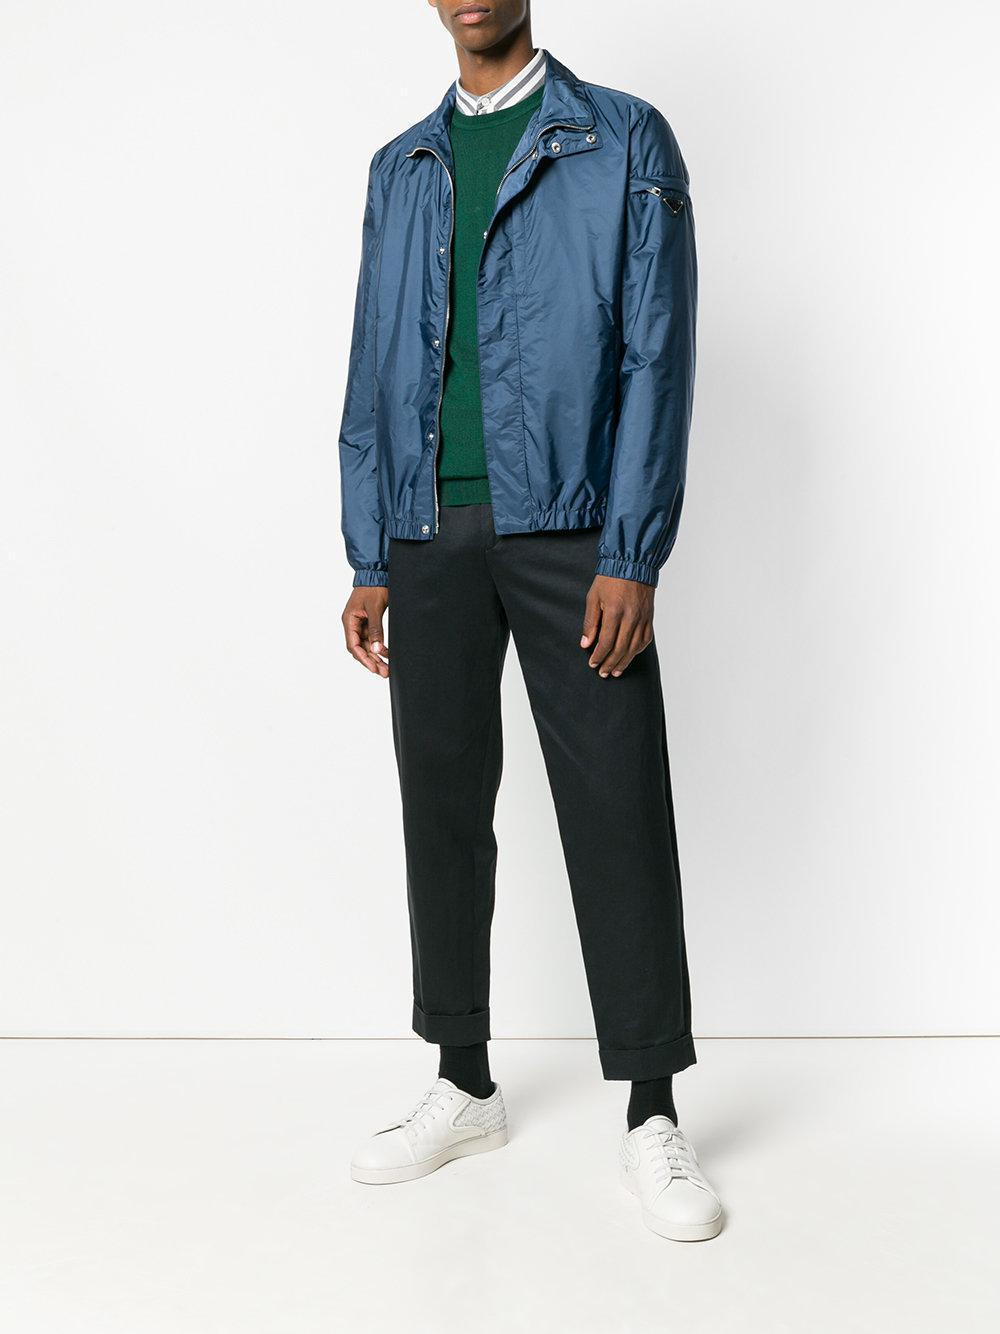 82b28c3534546 Lyst - Polo Ralph Lauren Classic Fit Jumper in Green for Men